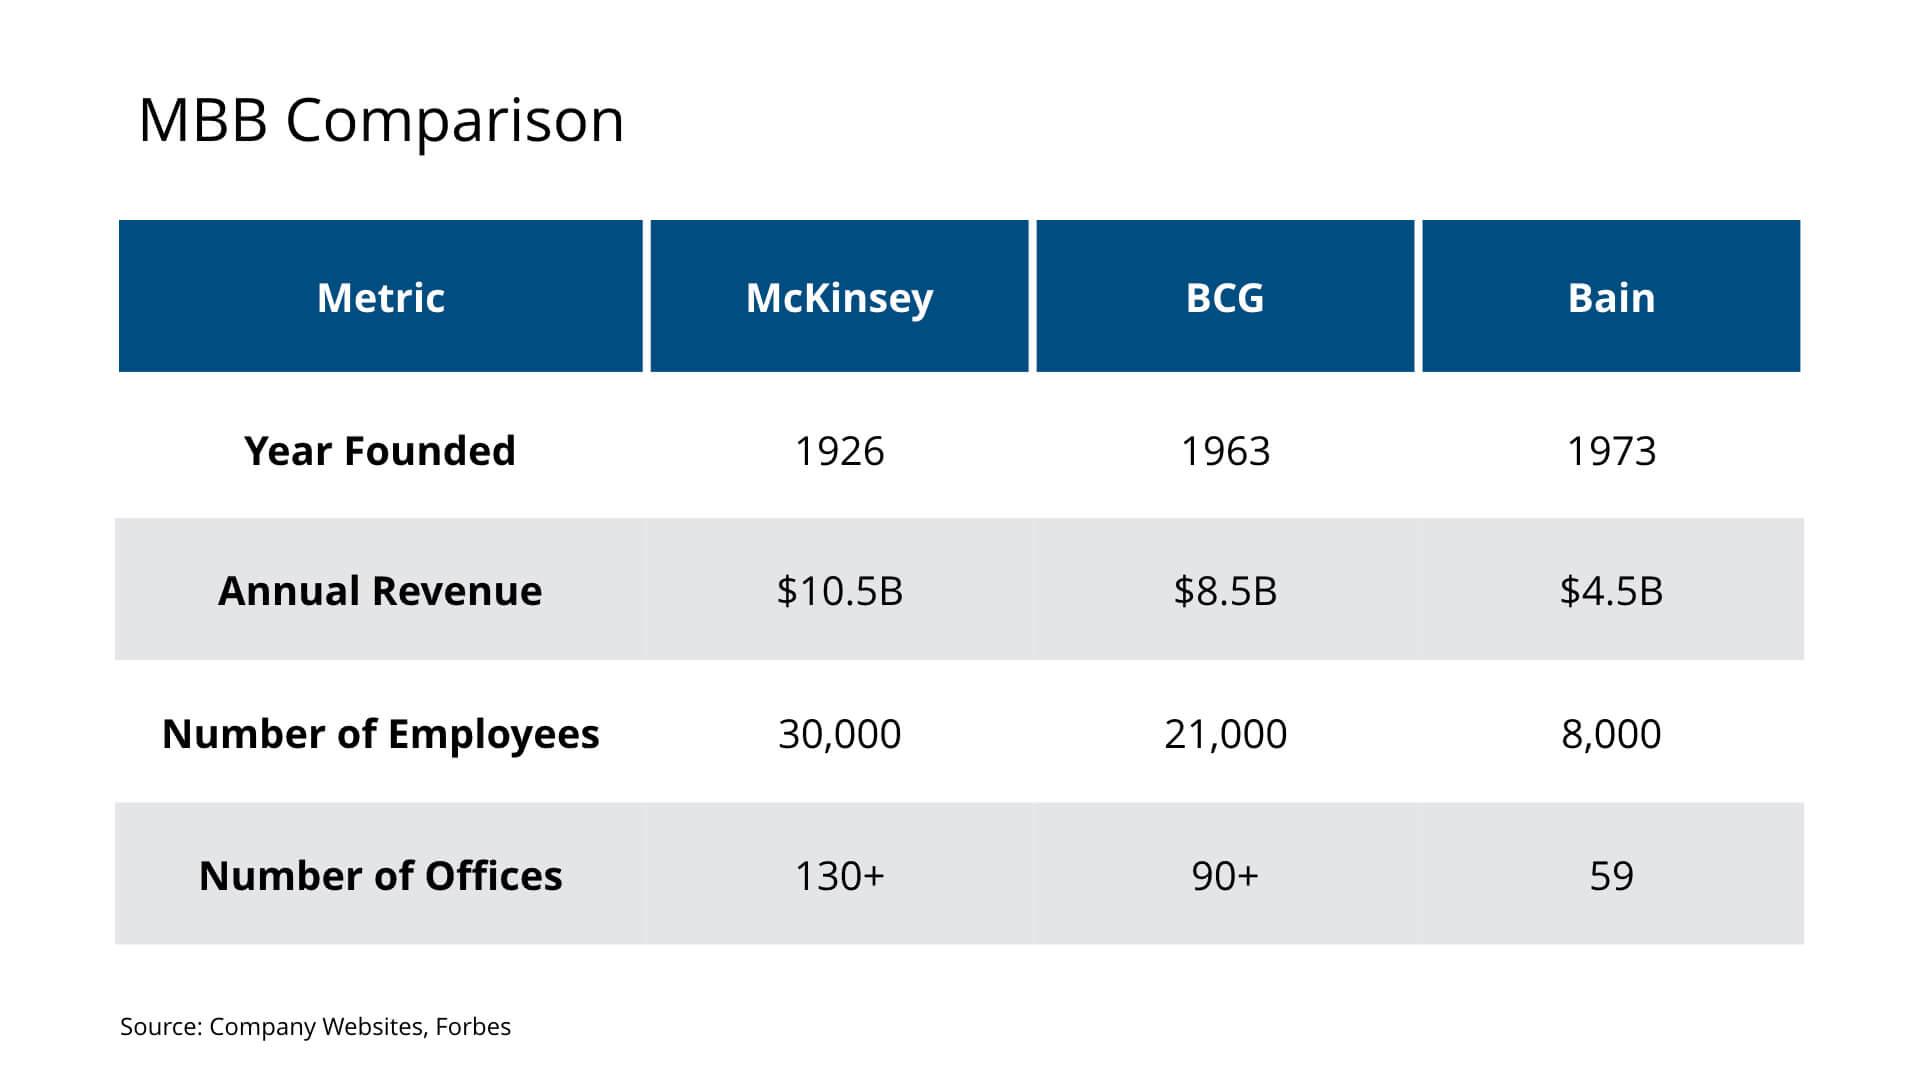 MBB - McKinsey BCG Bain Comparison